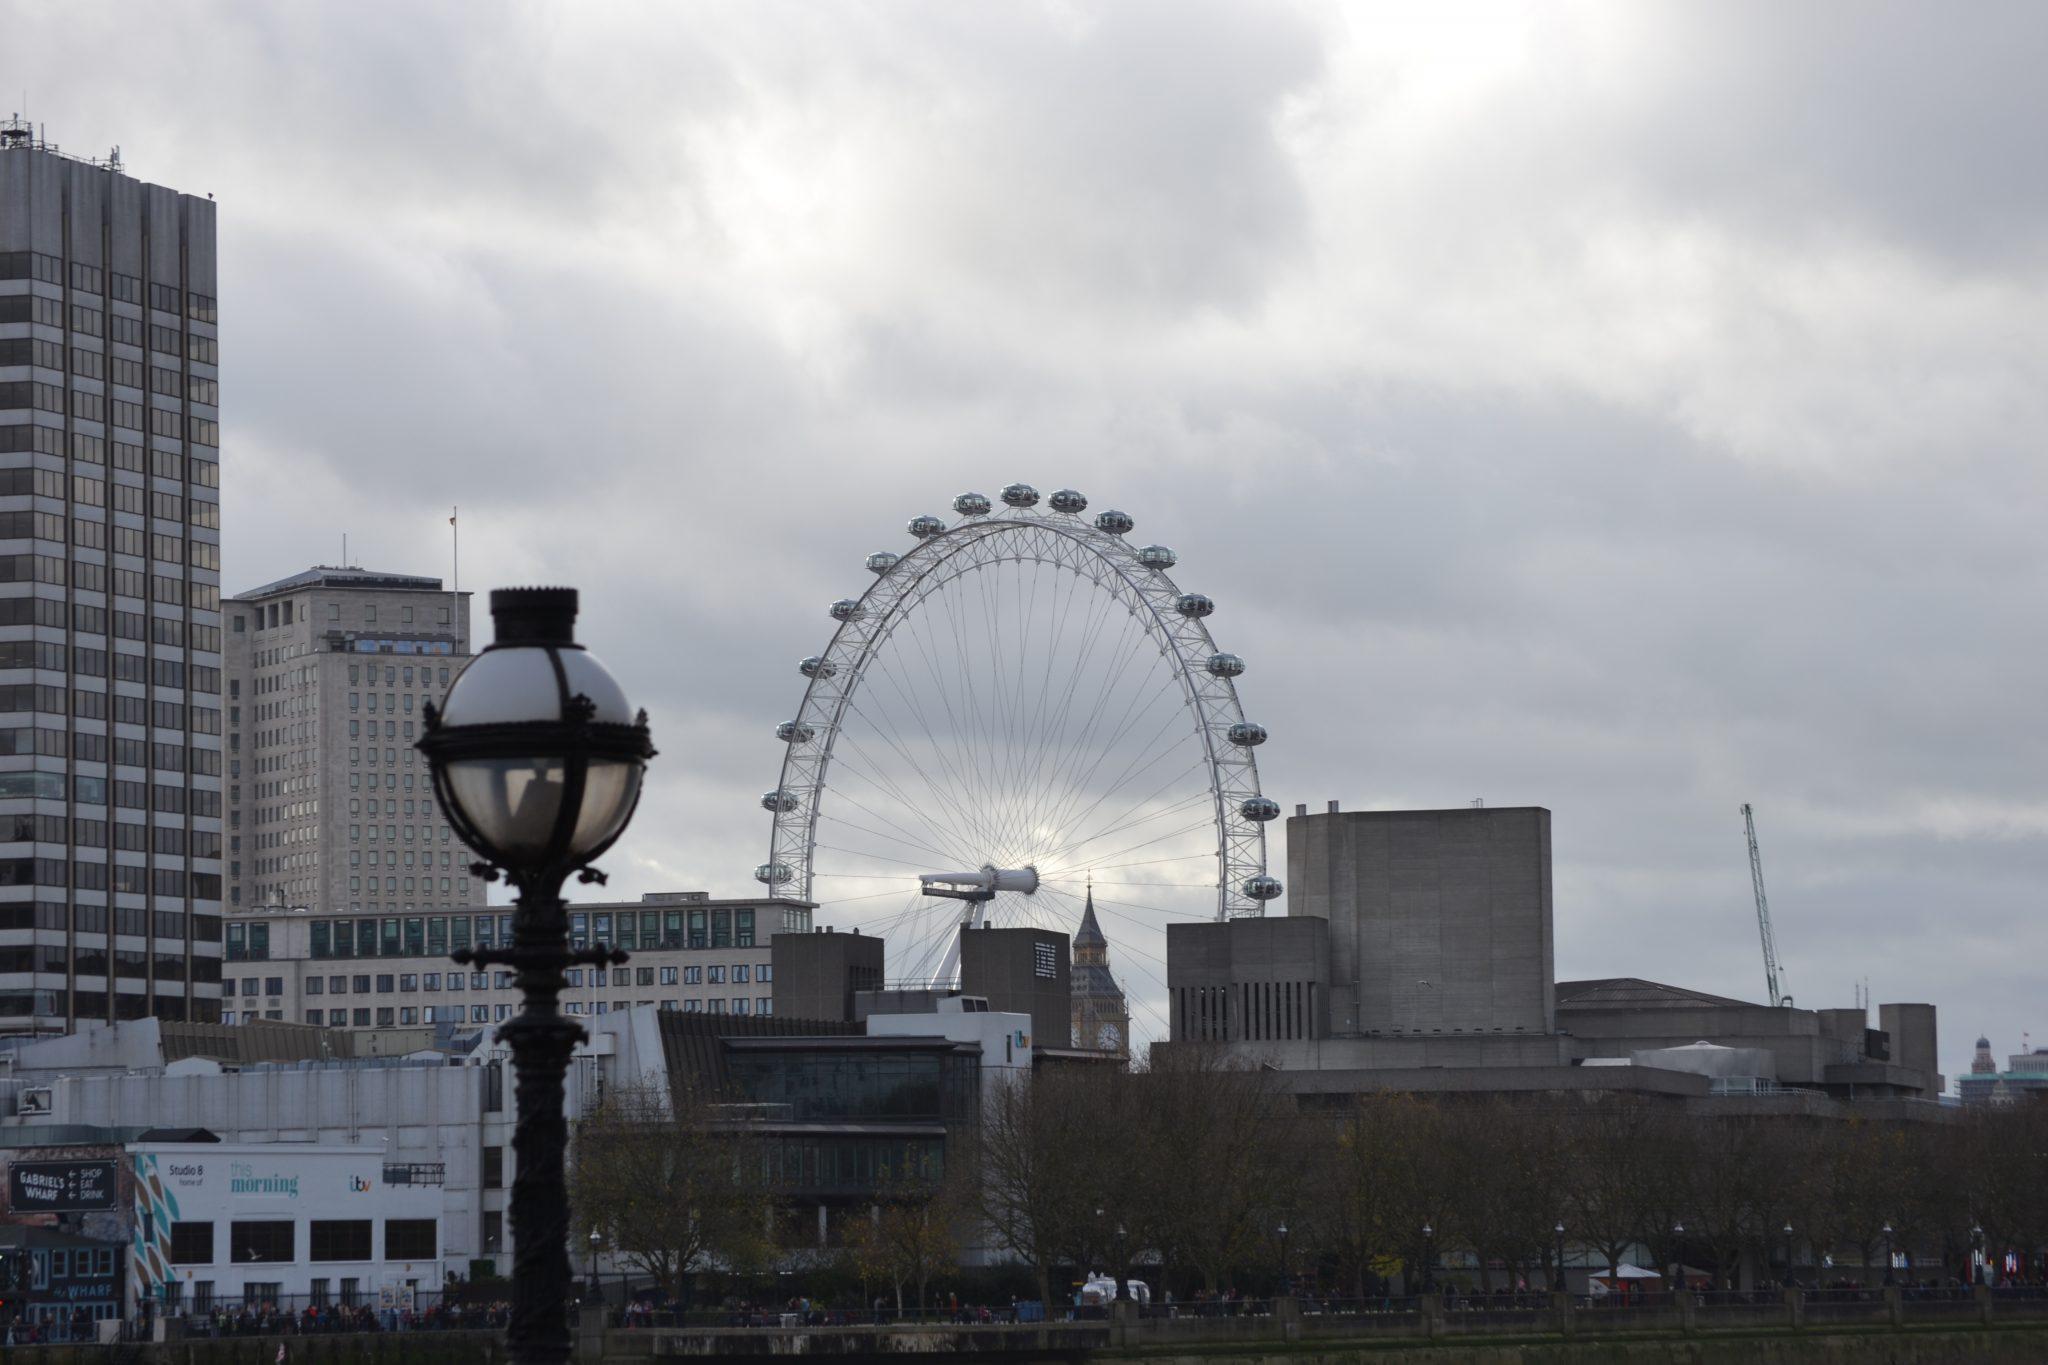 Travel Diary: London Part 3 | Stadtrundfahrt & Sky Garden - DSC 0192